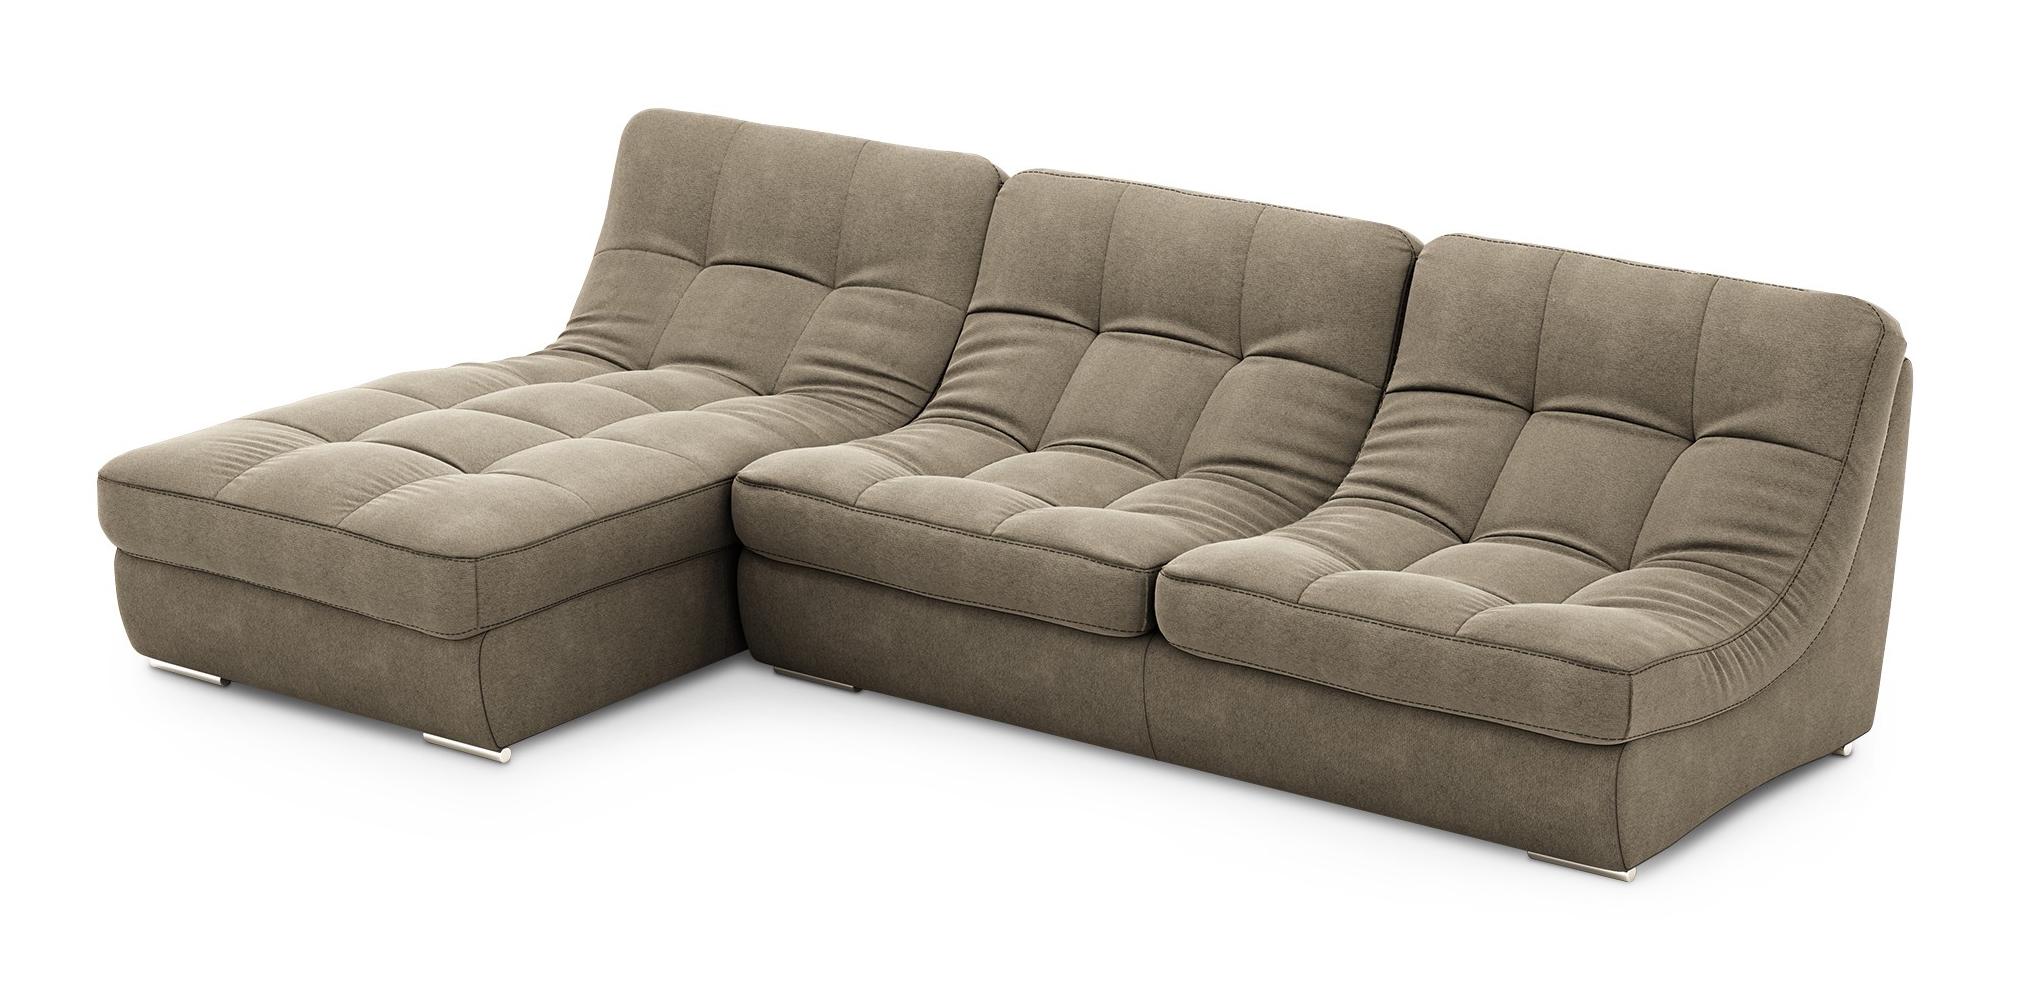 Угловой диван Палермо с оттоманкой LAVSOFA